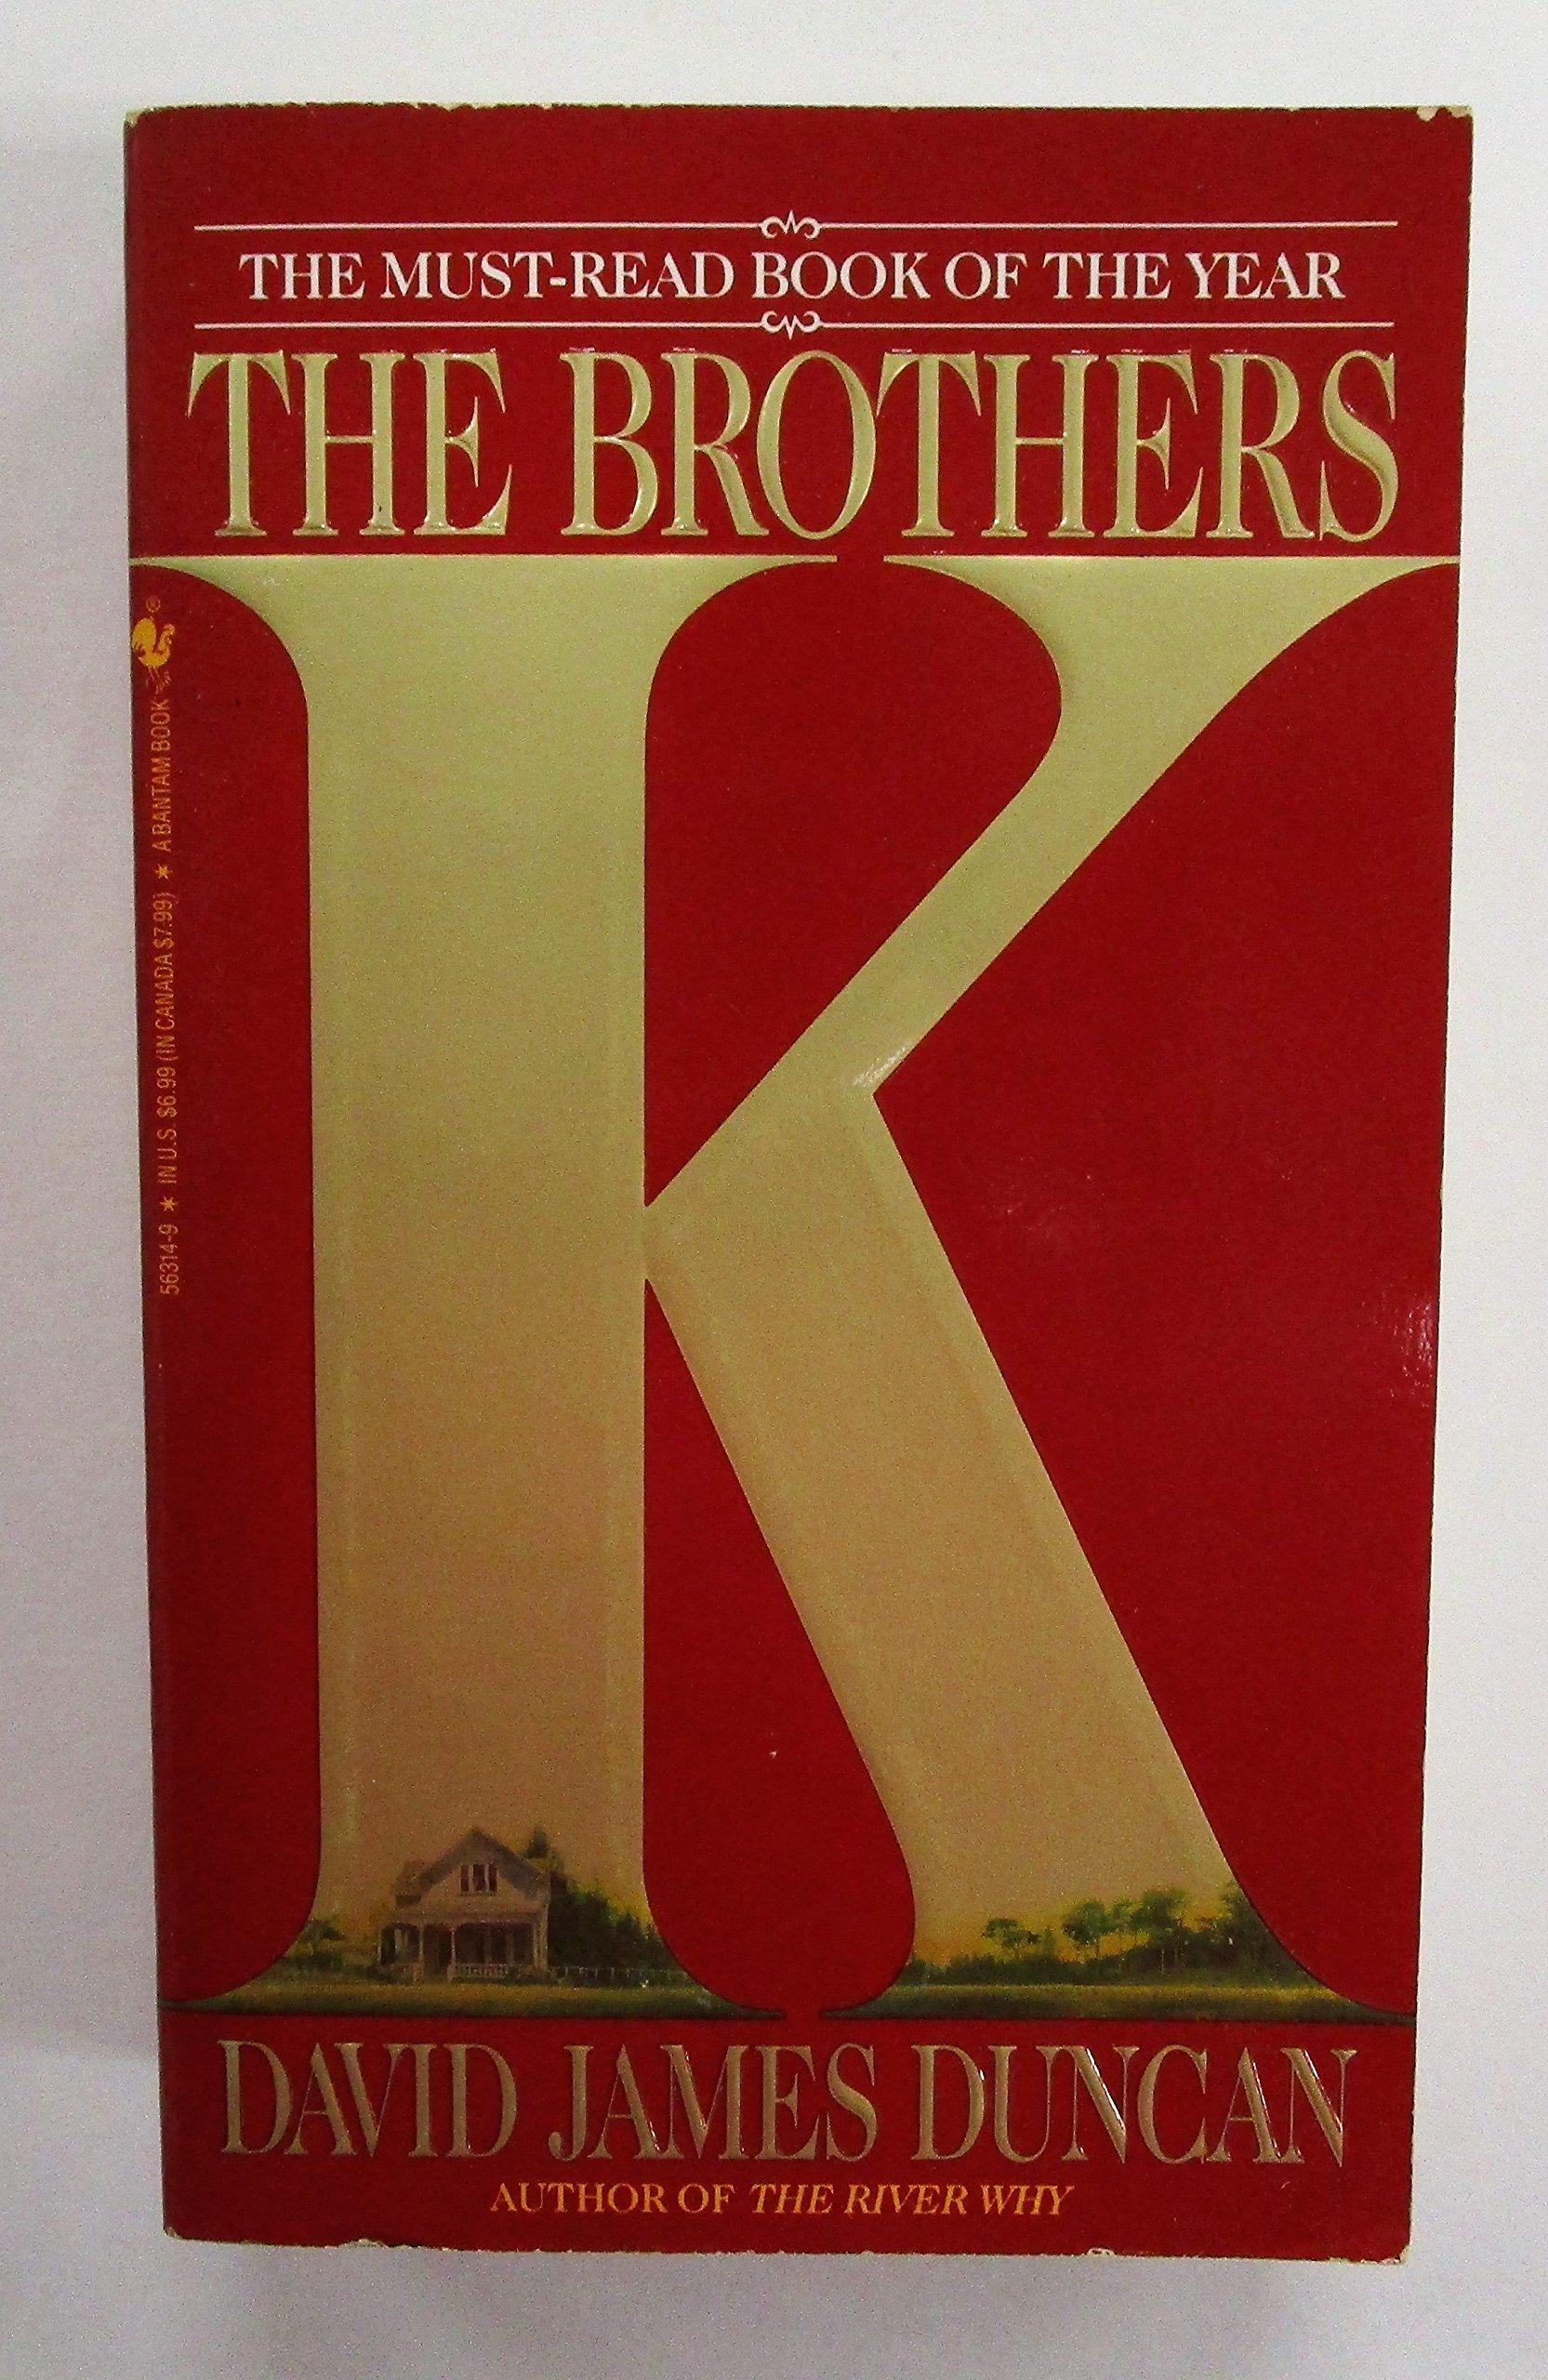 Brothers K, The, Duncan, David James